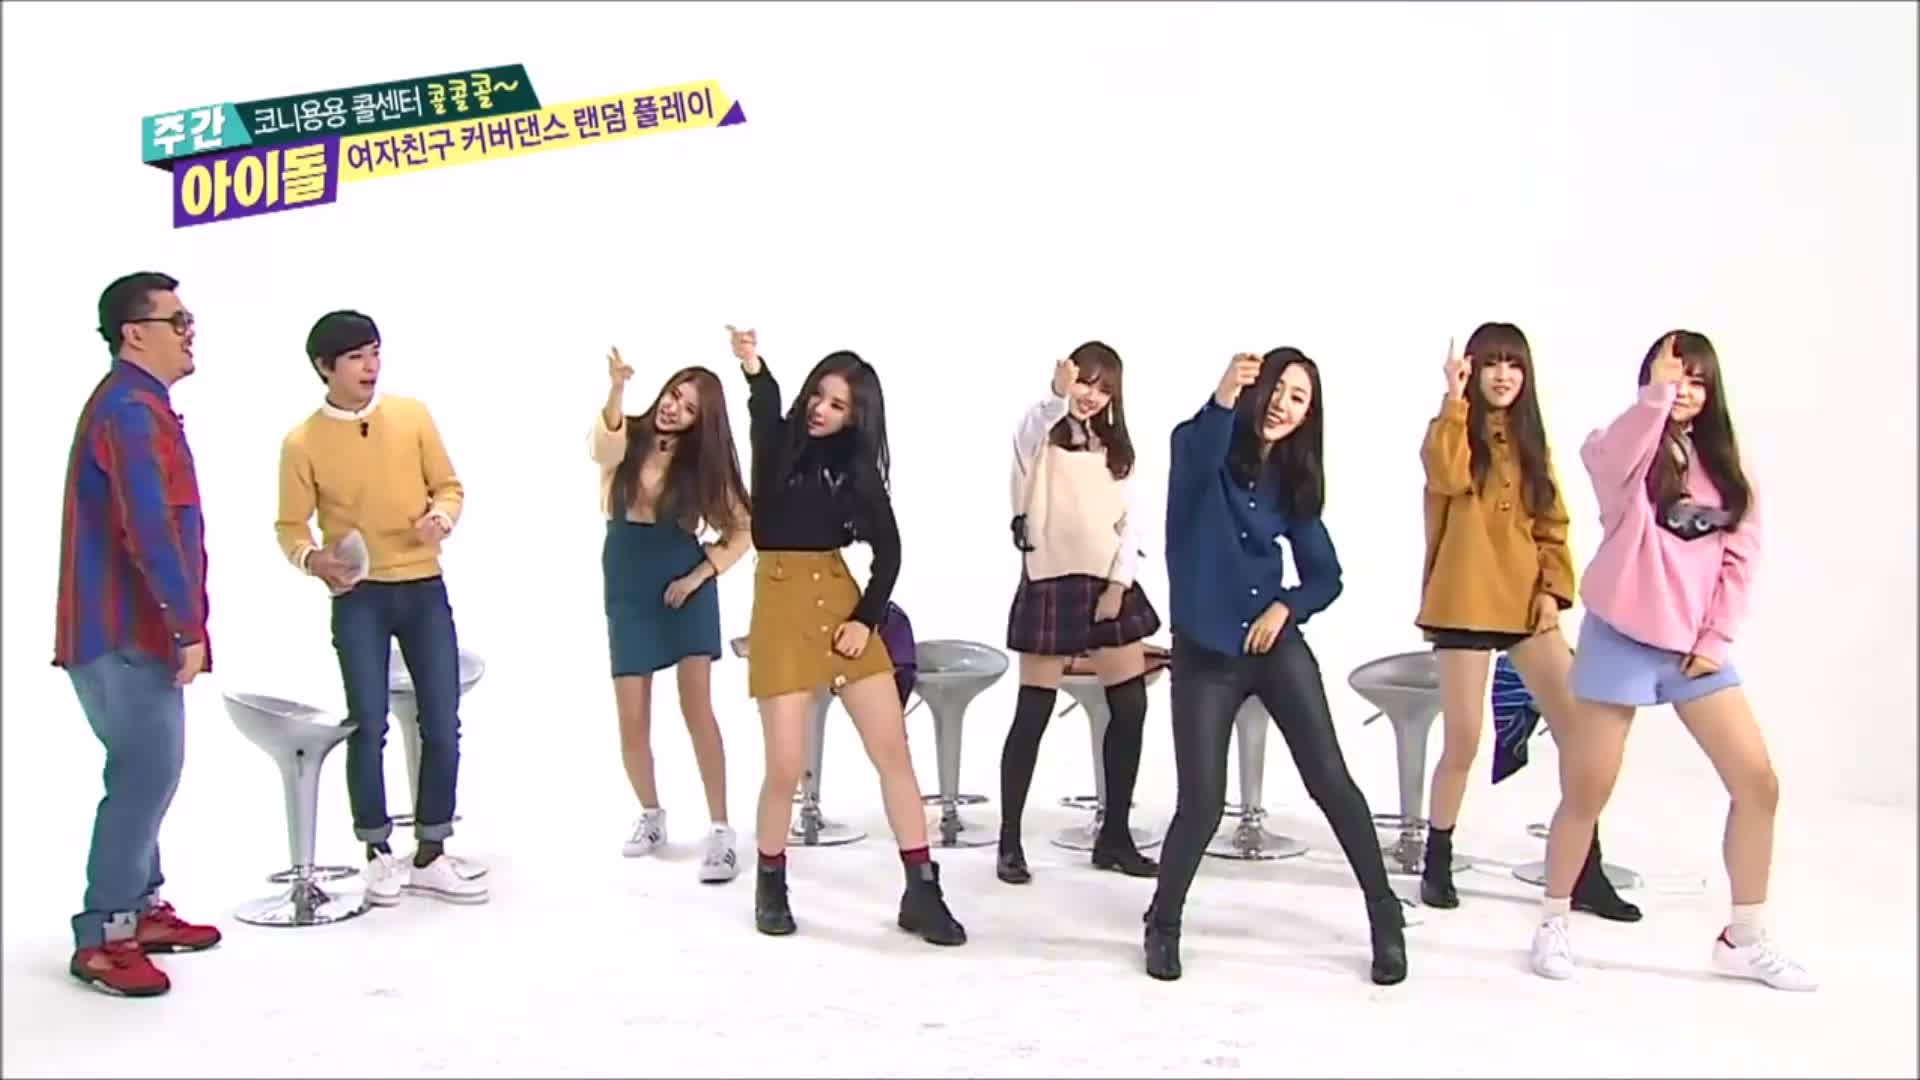 gfriend, kpop, weekly idol, GFriend GIFs